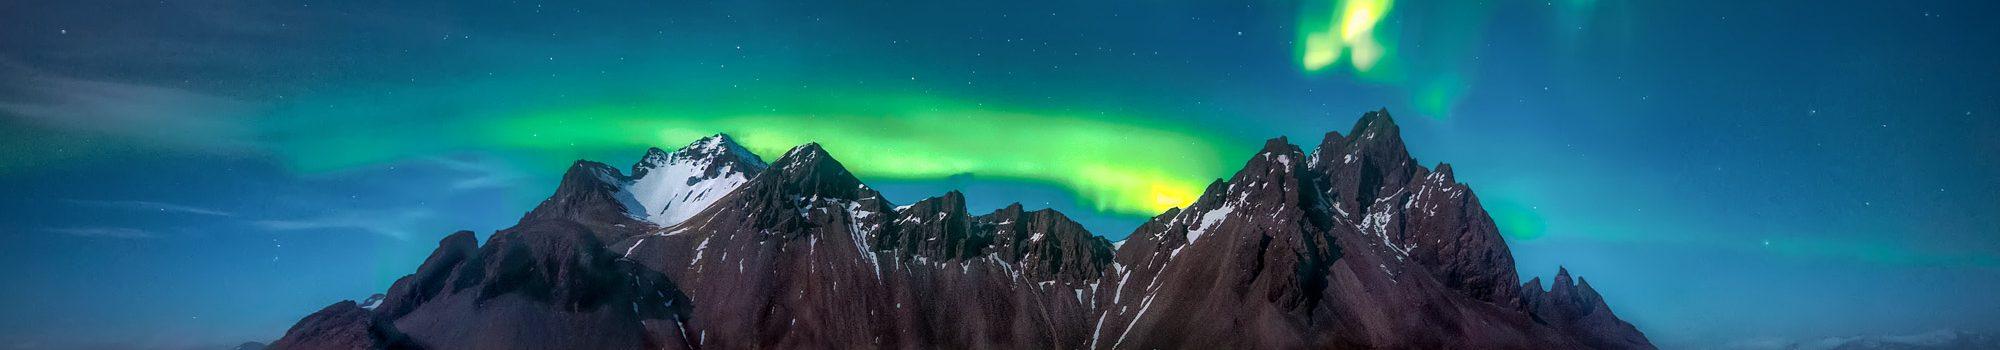 Northern Lights Green Reflection